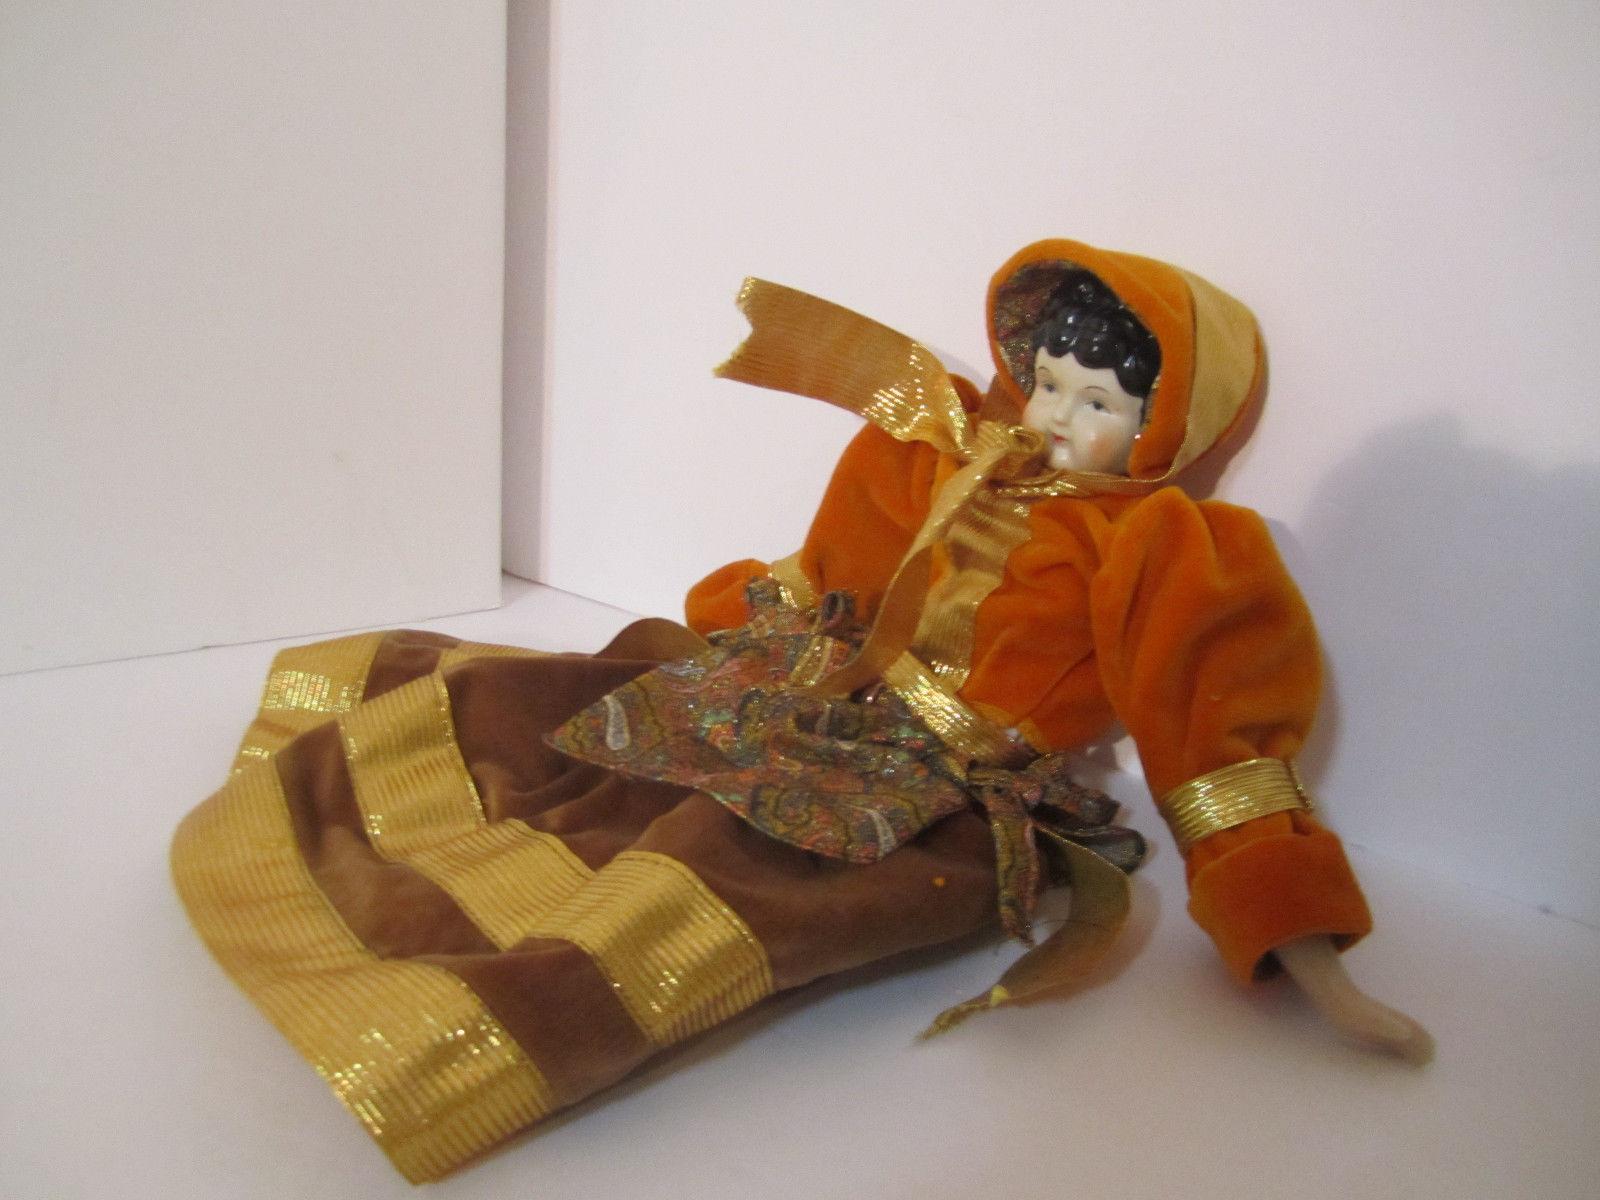 Elegant Repro Porcelain Brunette Doll Orange & Paisley Dress GORGEOUS! image 9